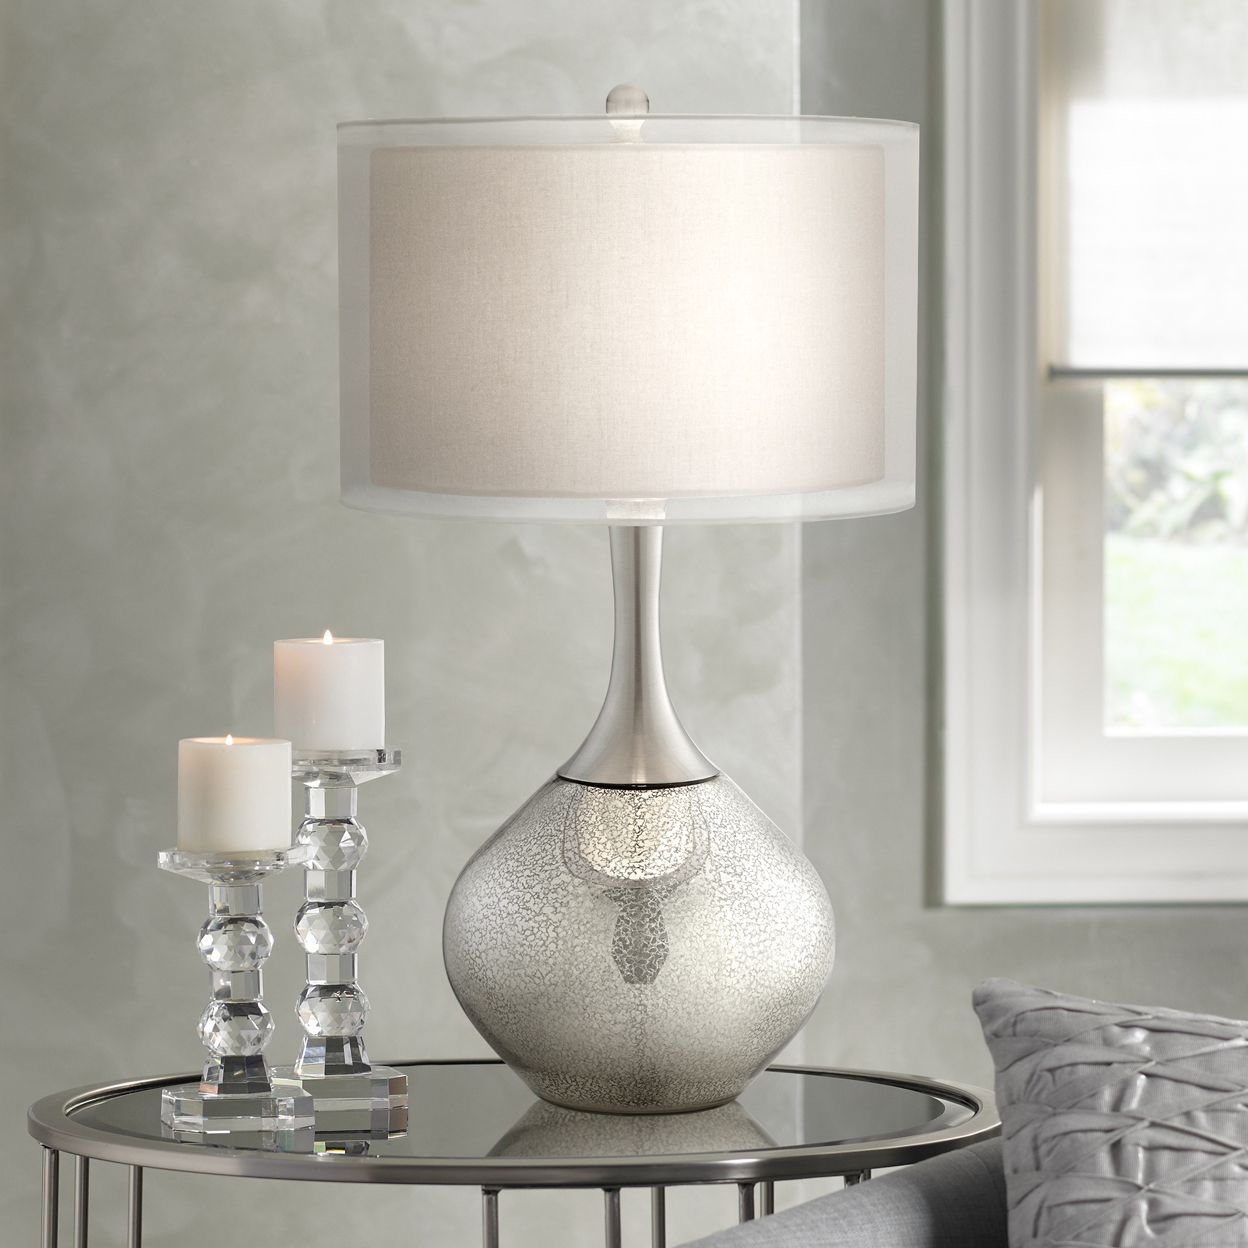 Elegant Possini Euro Design Swift Modern Mercury Glass Table Lamp silver nightstand lamps